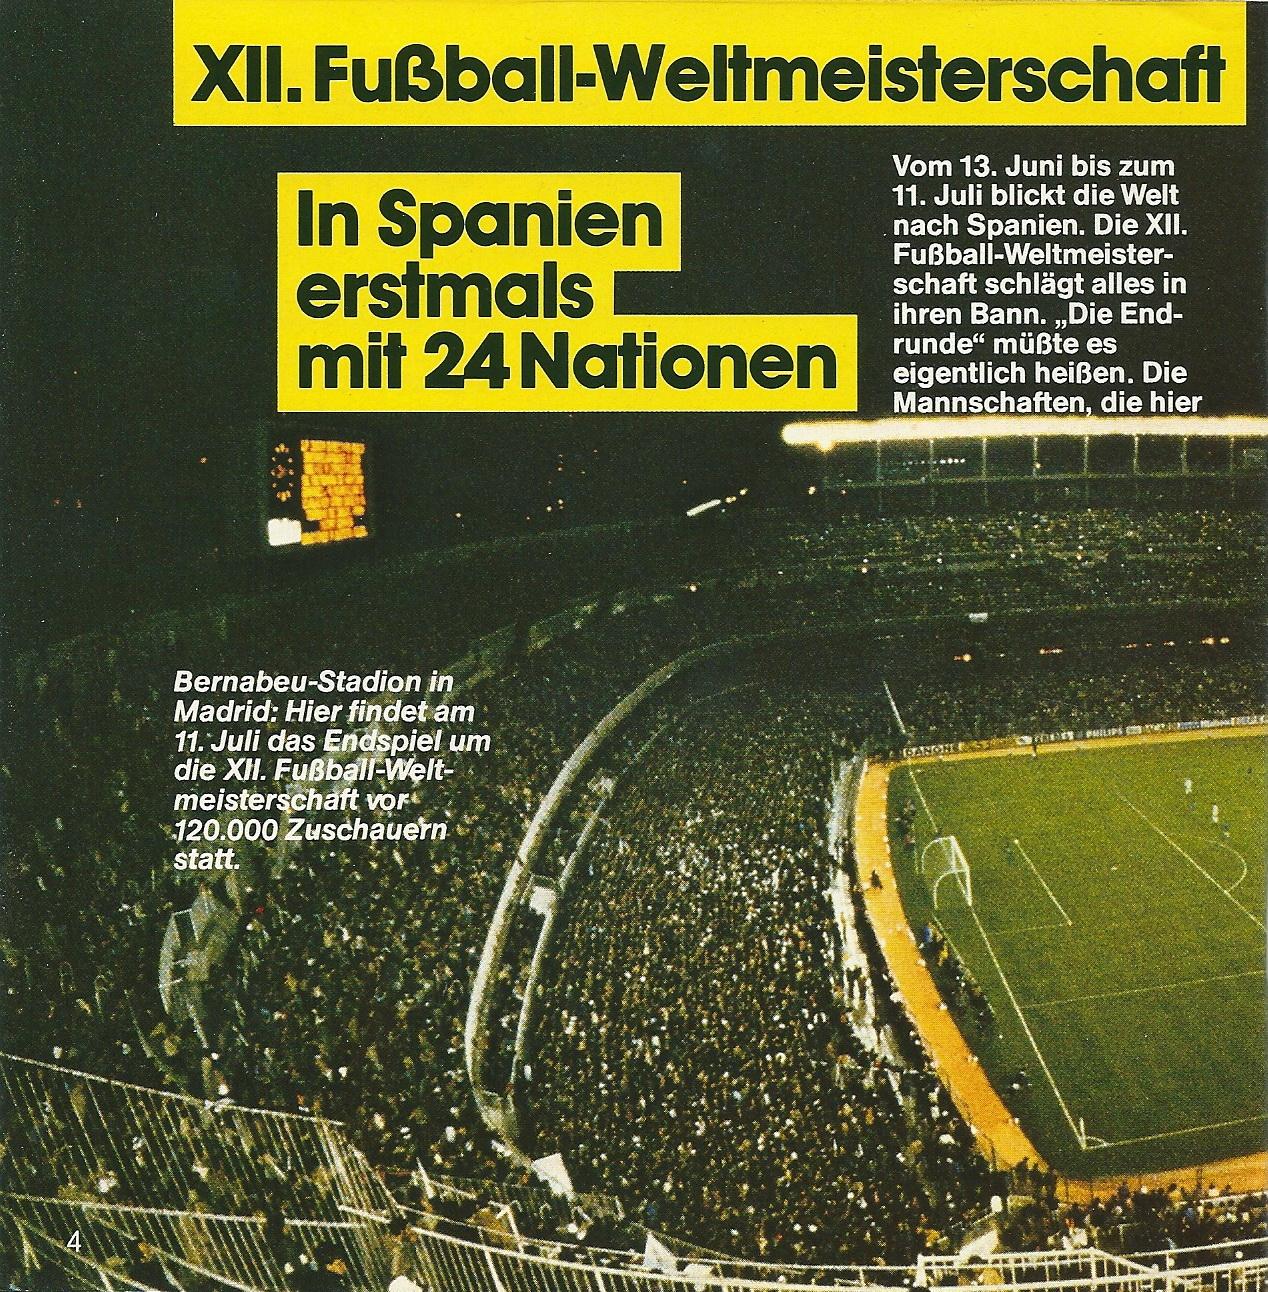 Live Wetten Fussball Heute Fu C3 9fballbertragung Live Wiring Library